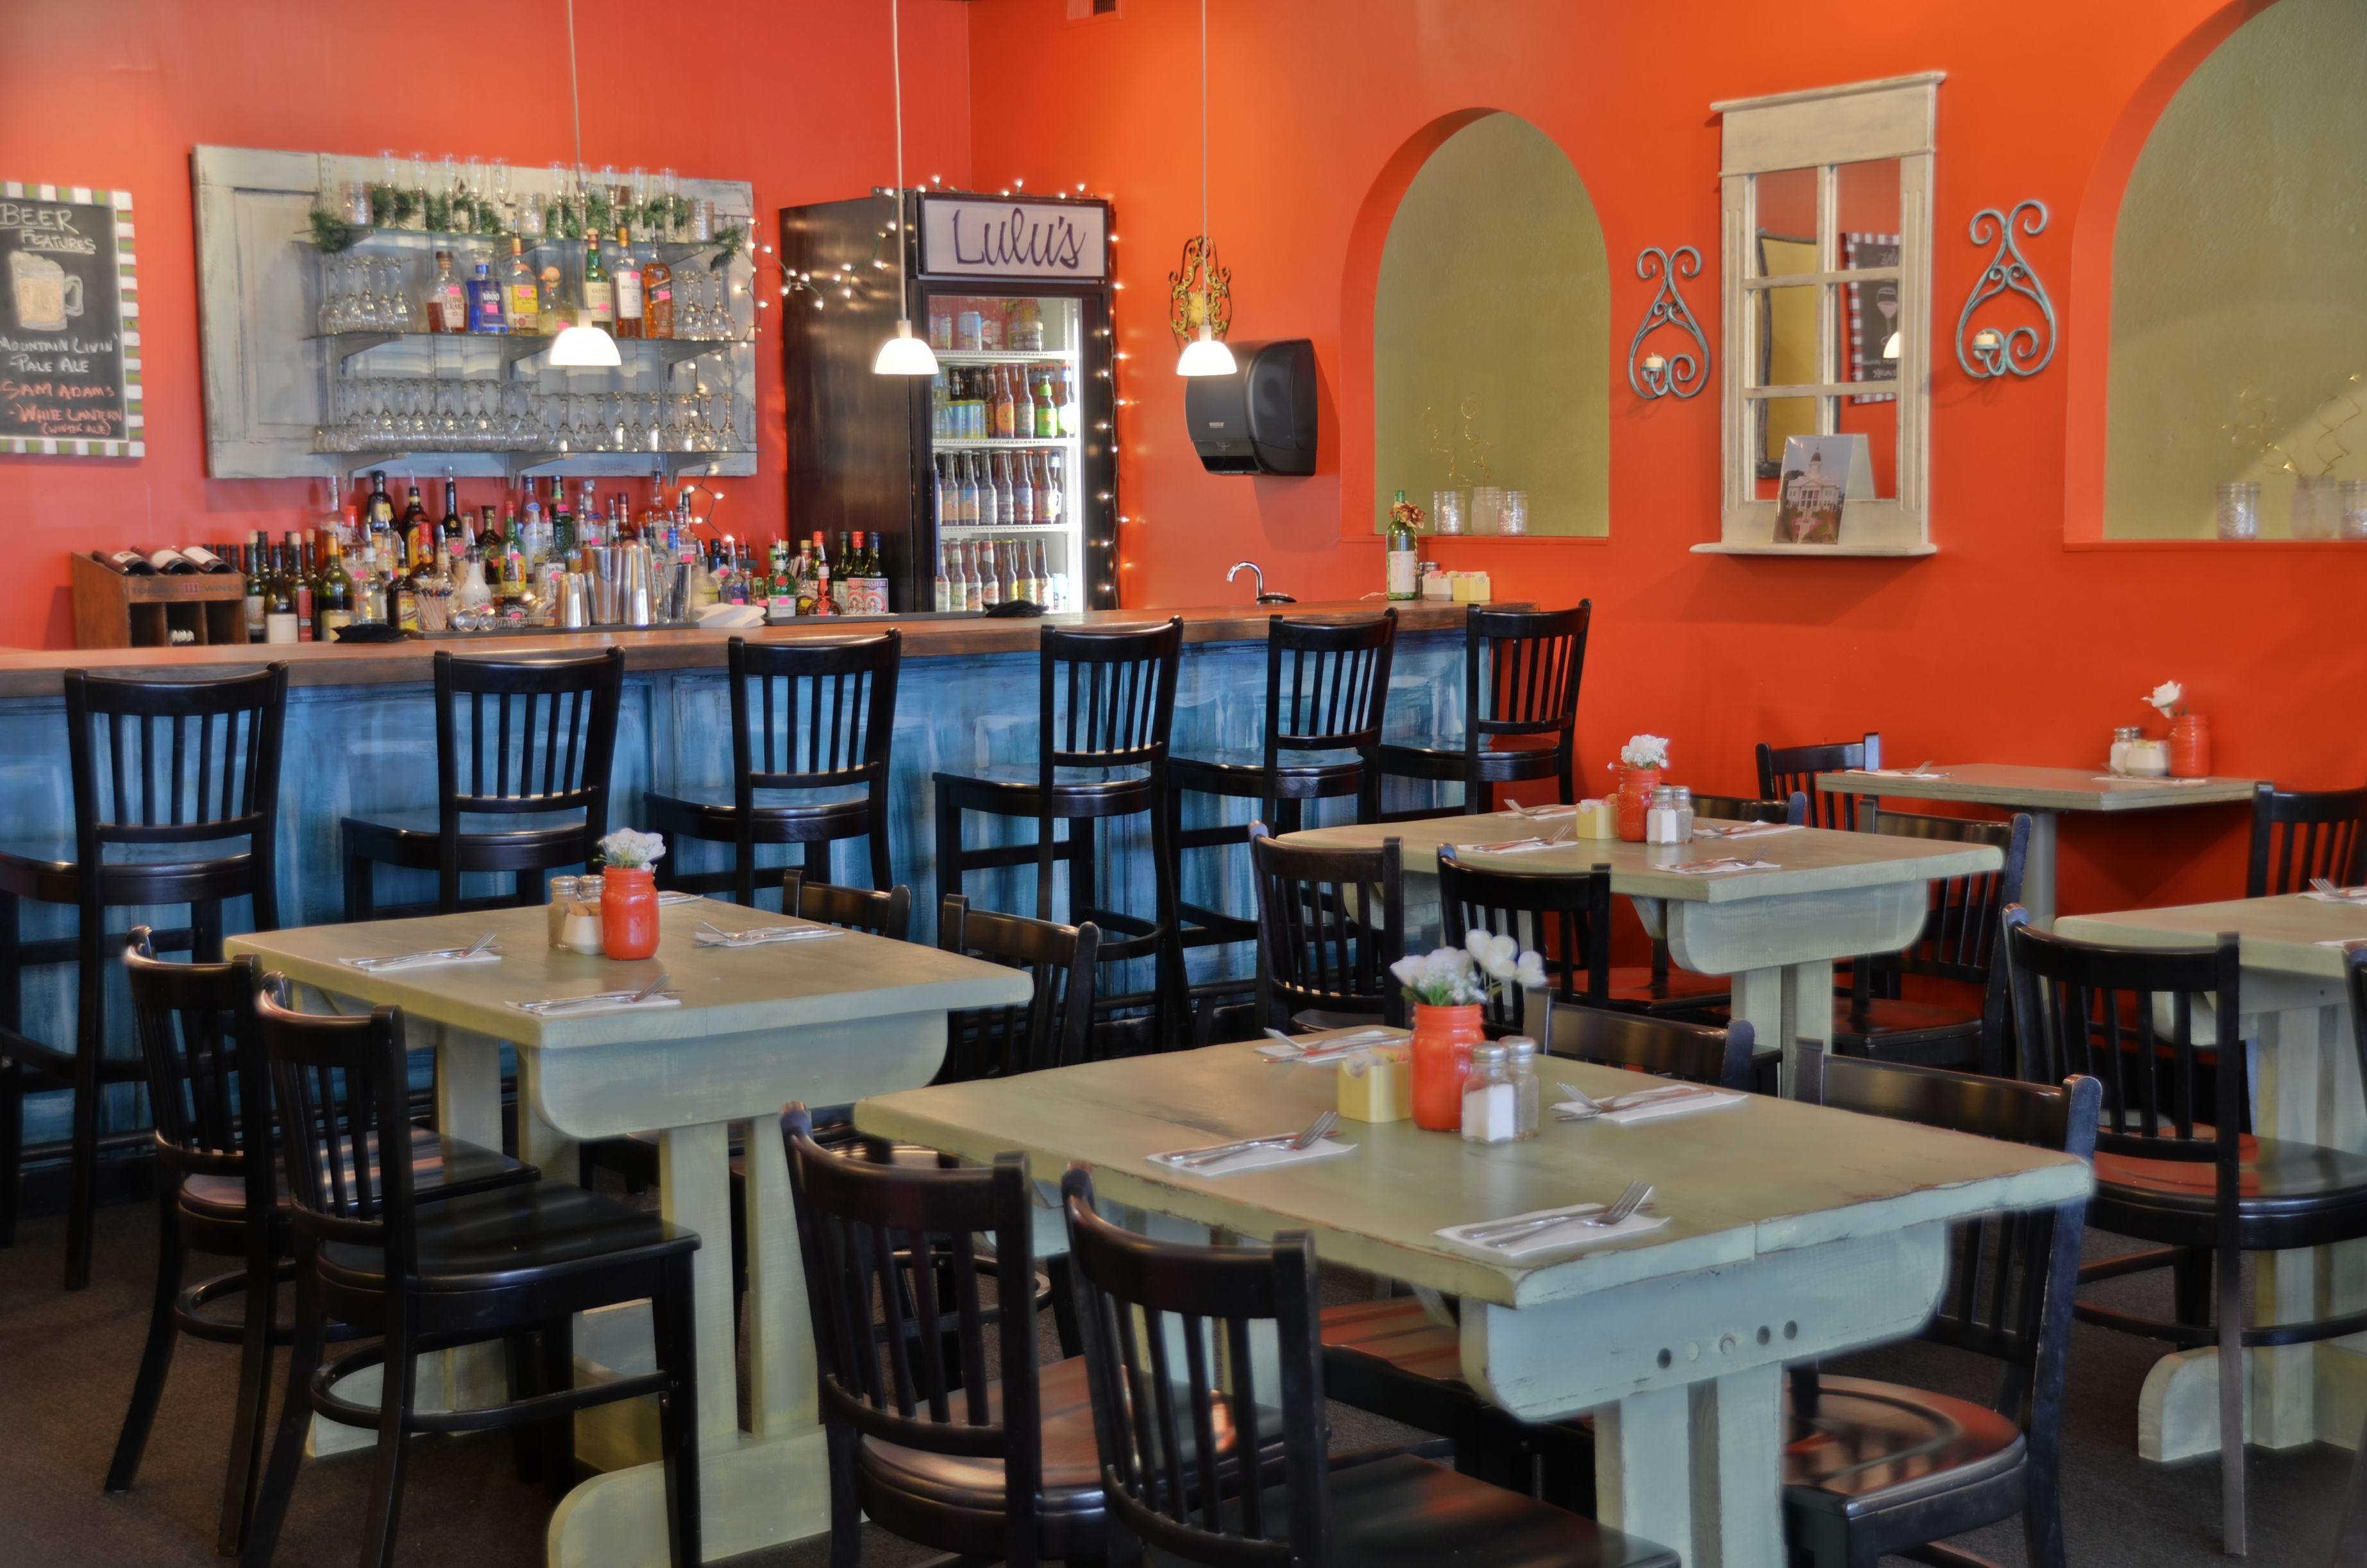 Restaurant In Downtown Sylva North Carolina Southern Living Magazine Restaurant Dillsboro